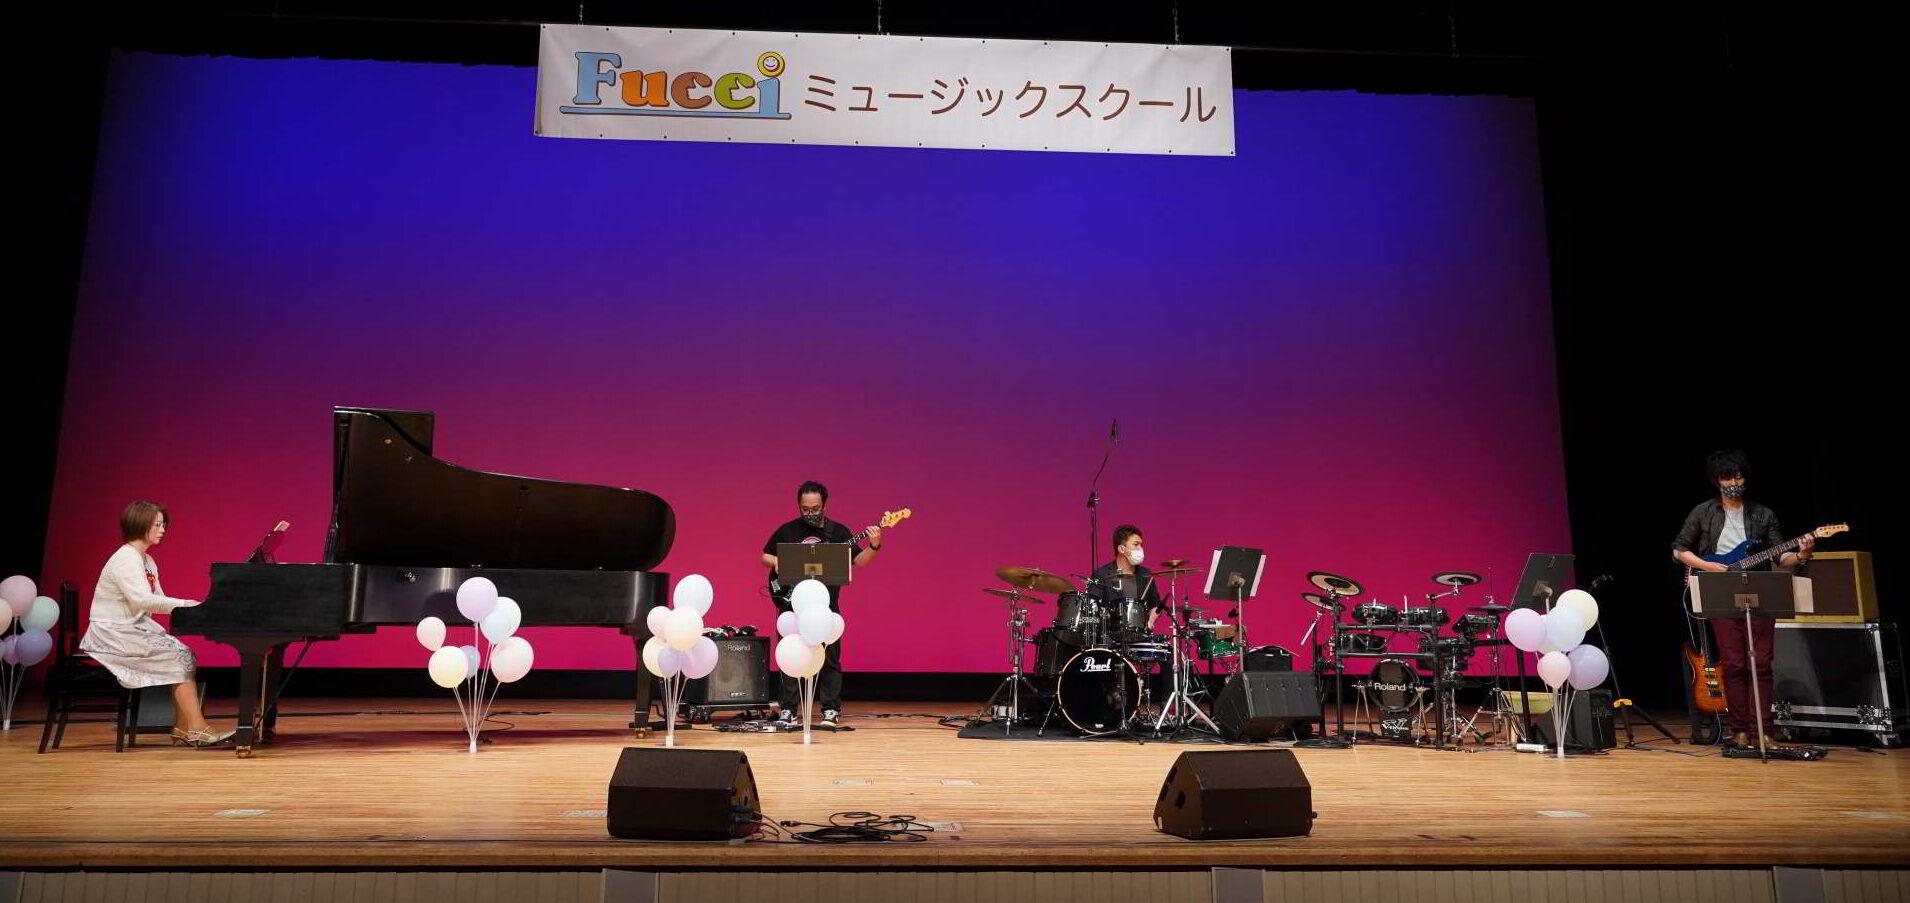 Fucci発表会ライブ2021